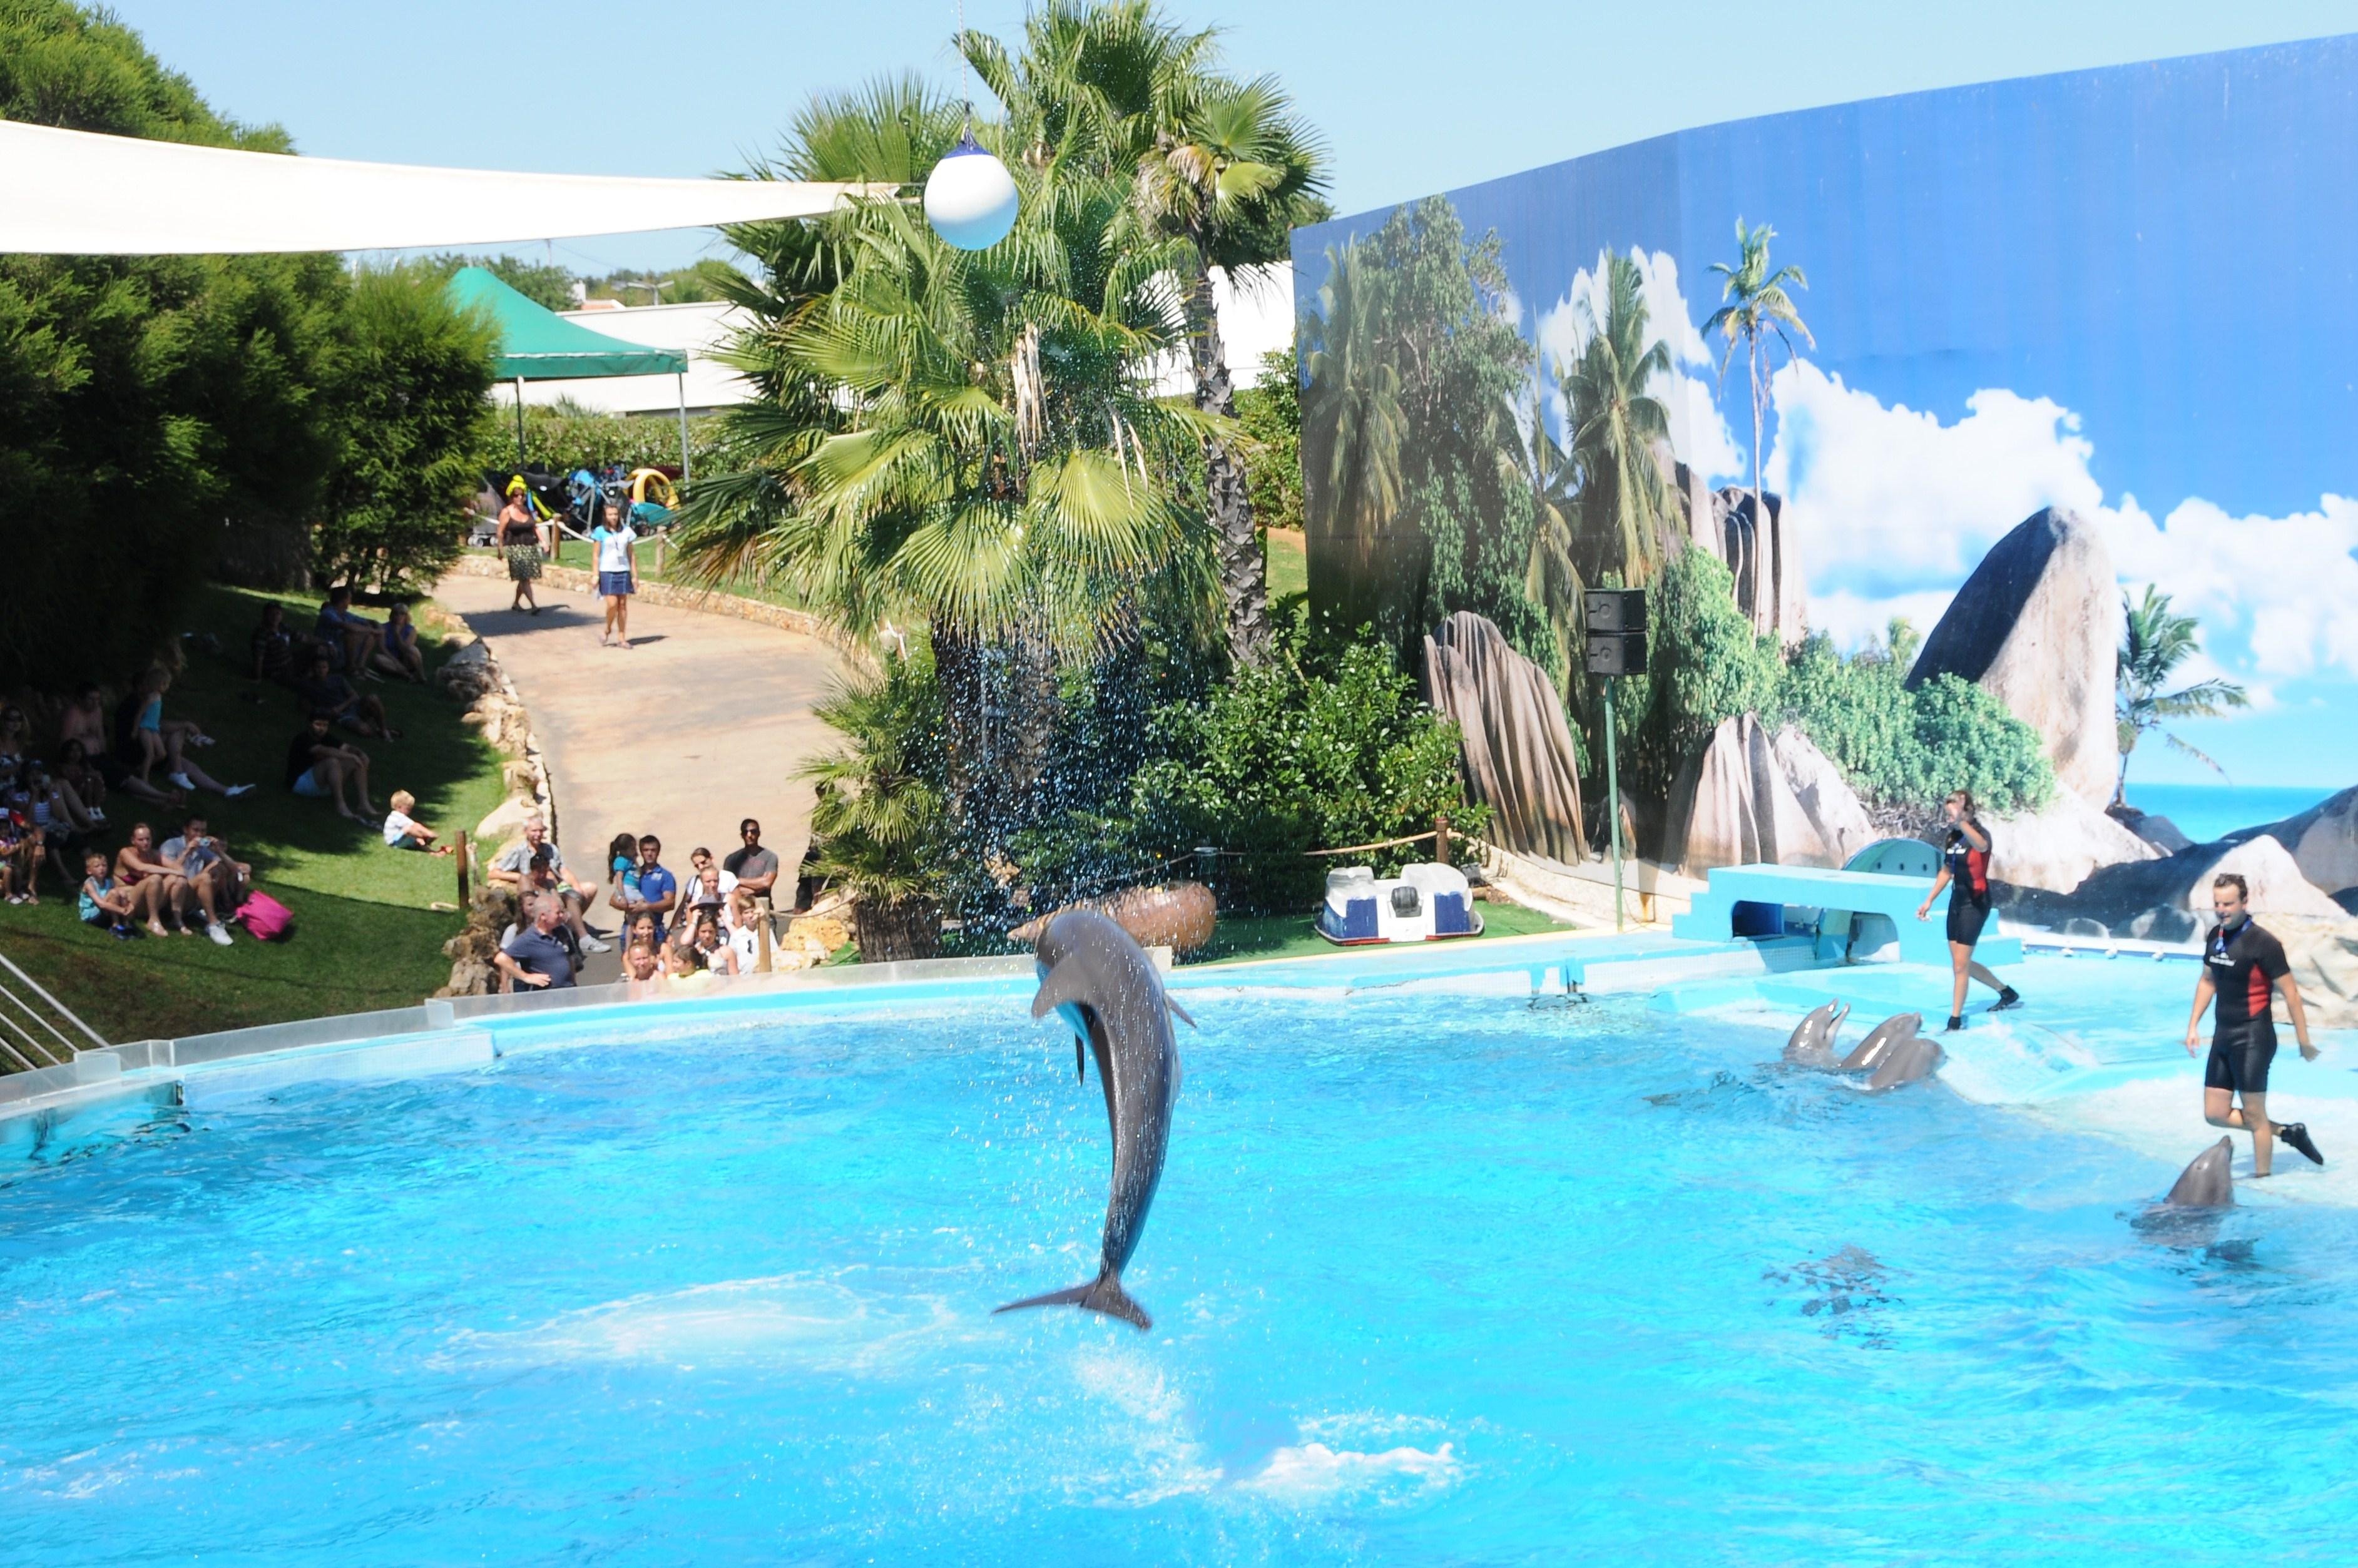 File:Zoomarine Dolphins (18).jpg